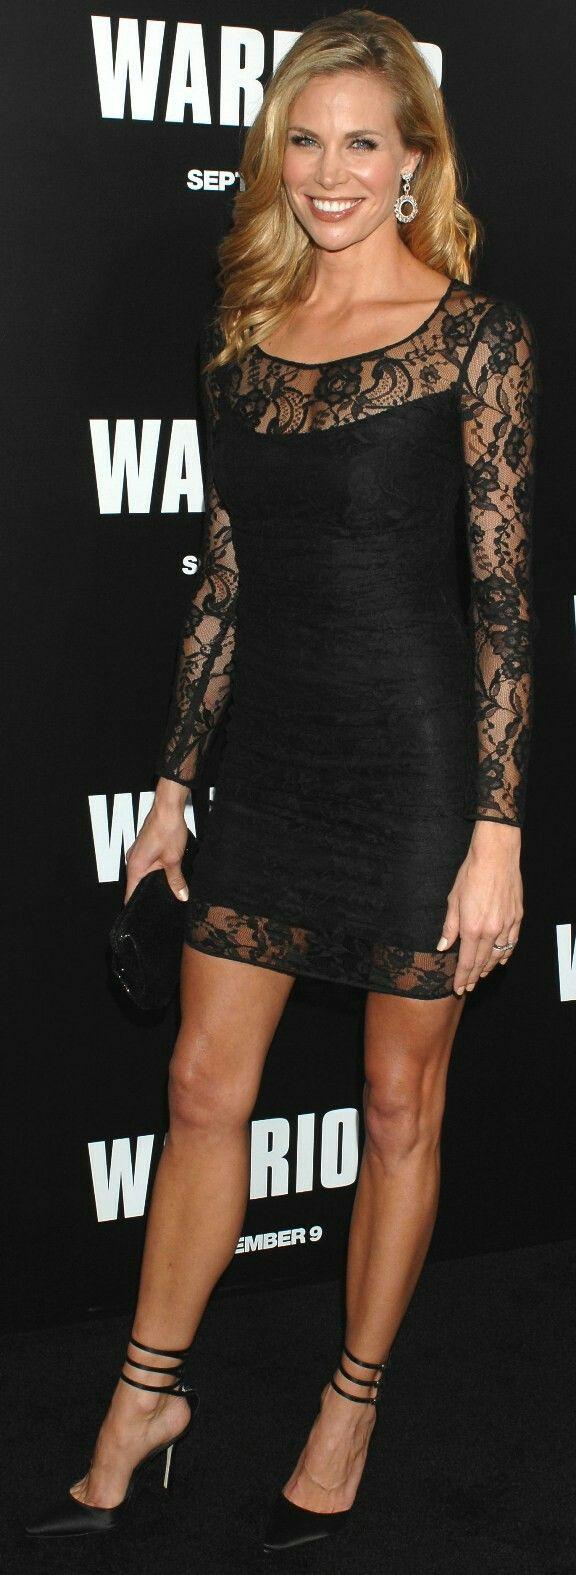 1000+ images about Brooke Burns on Pinterest | Actresses ... |Shorts Brooke Burns